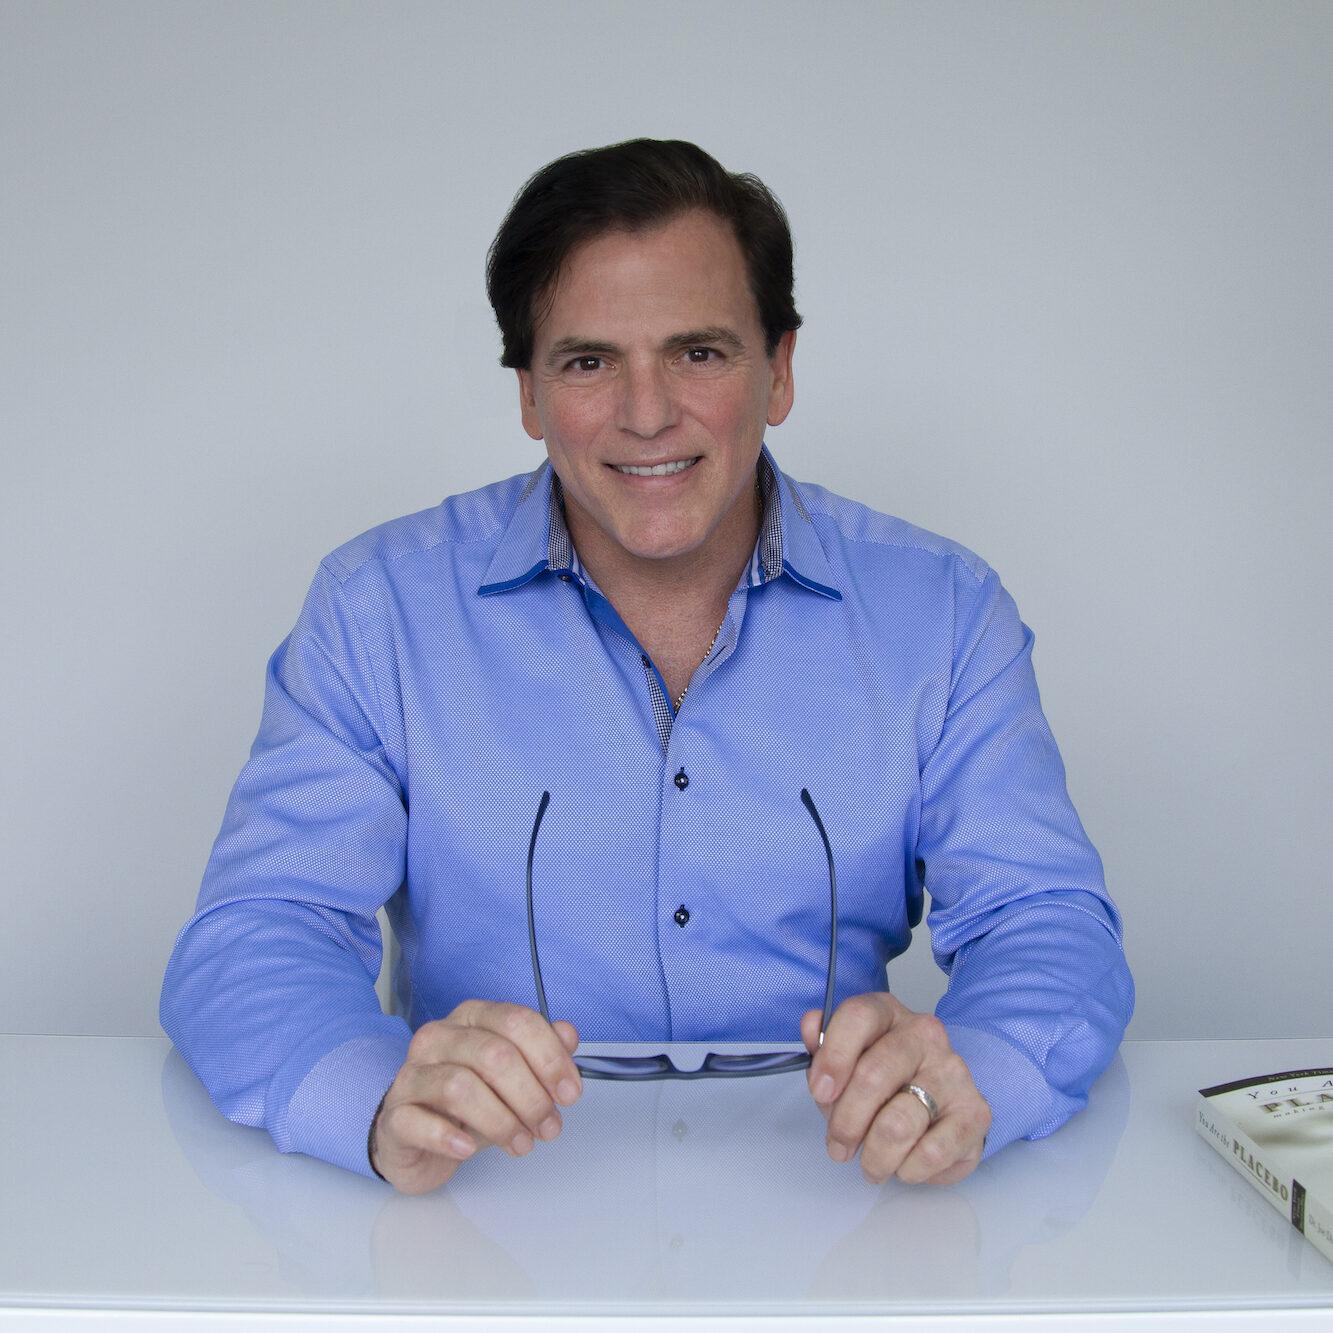 Dr John Salerno